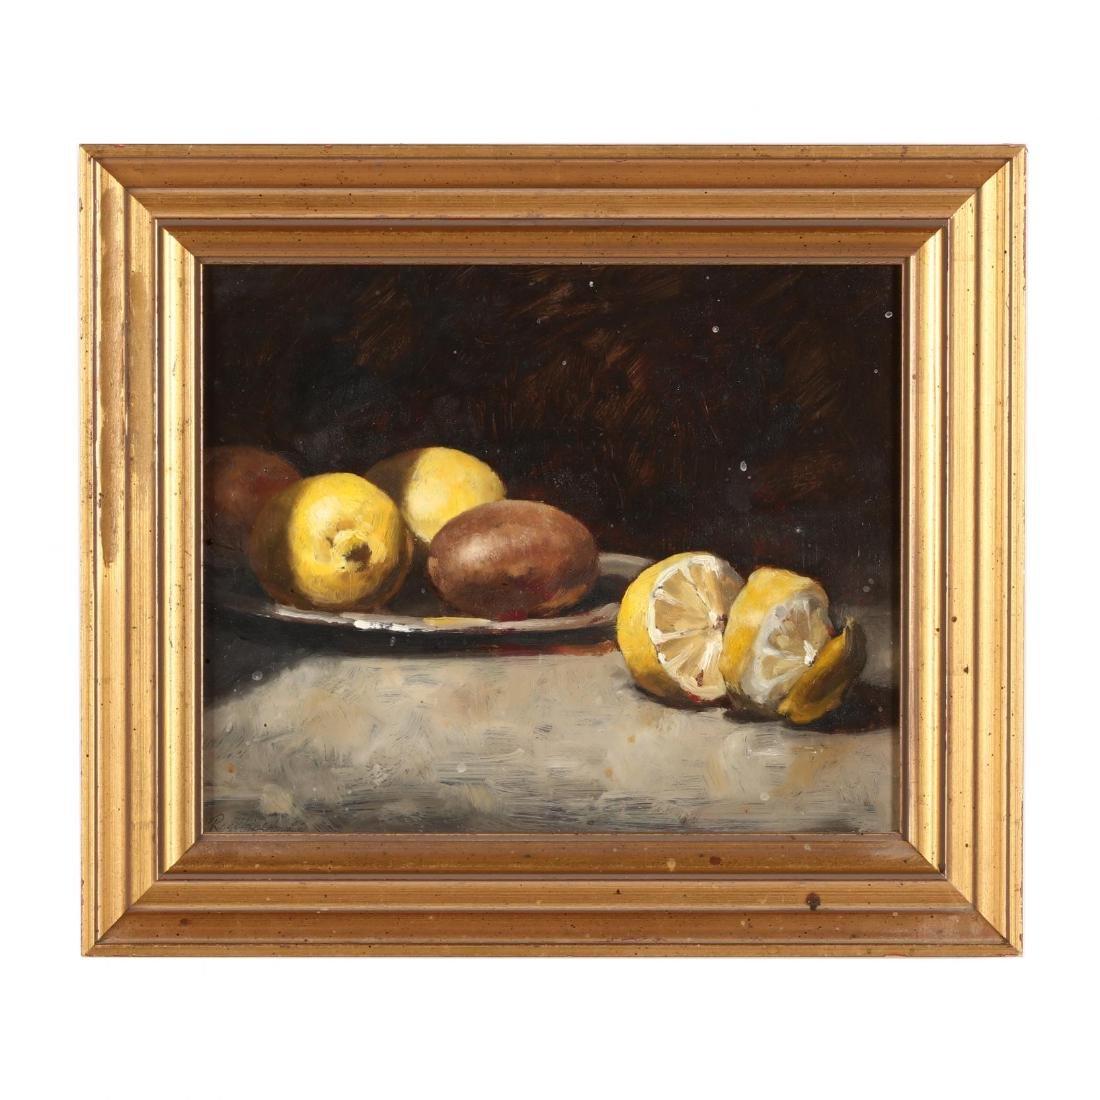 Russ Gordon (MD, b. 1968), Still Life with Lemons and